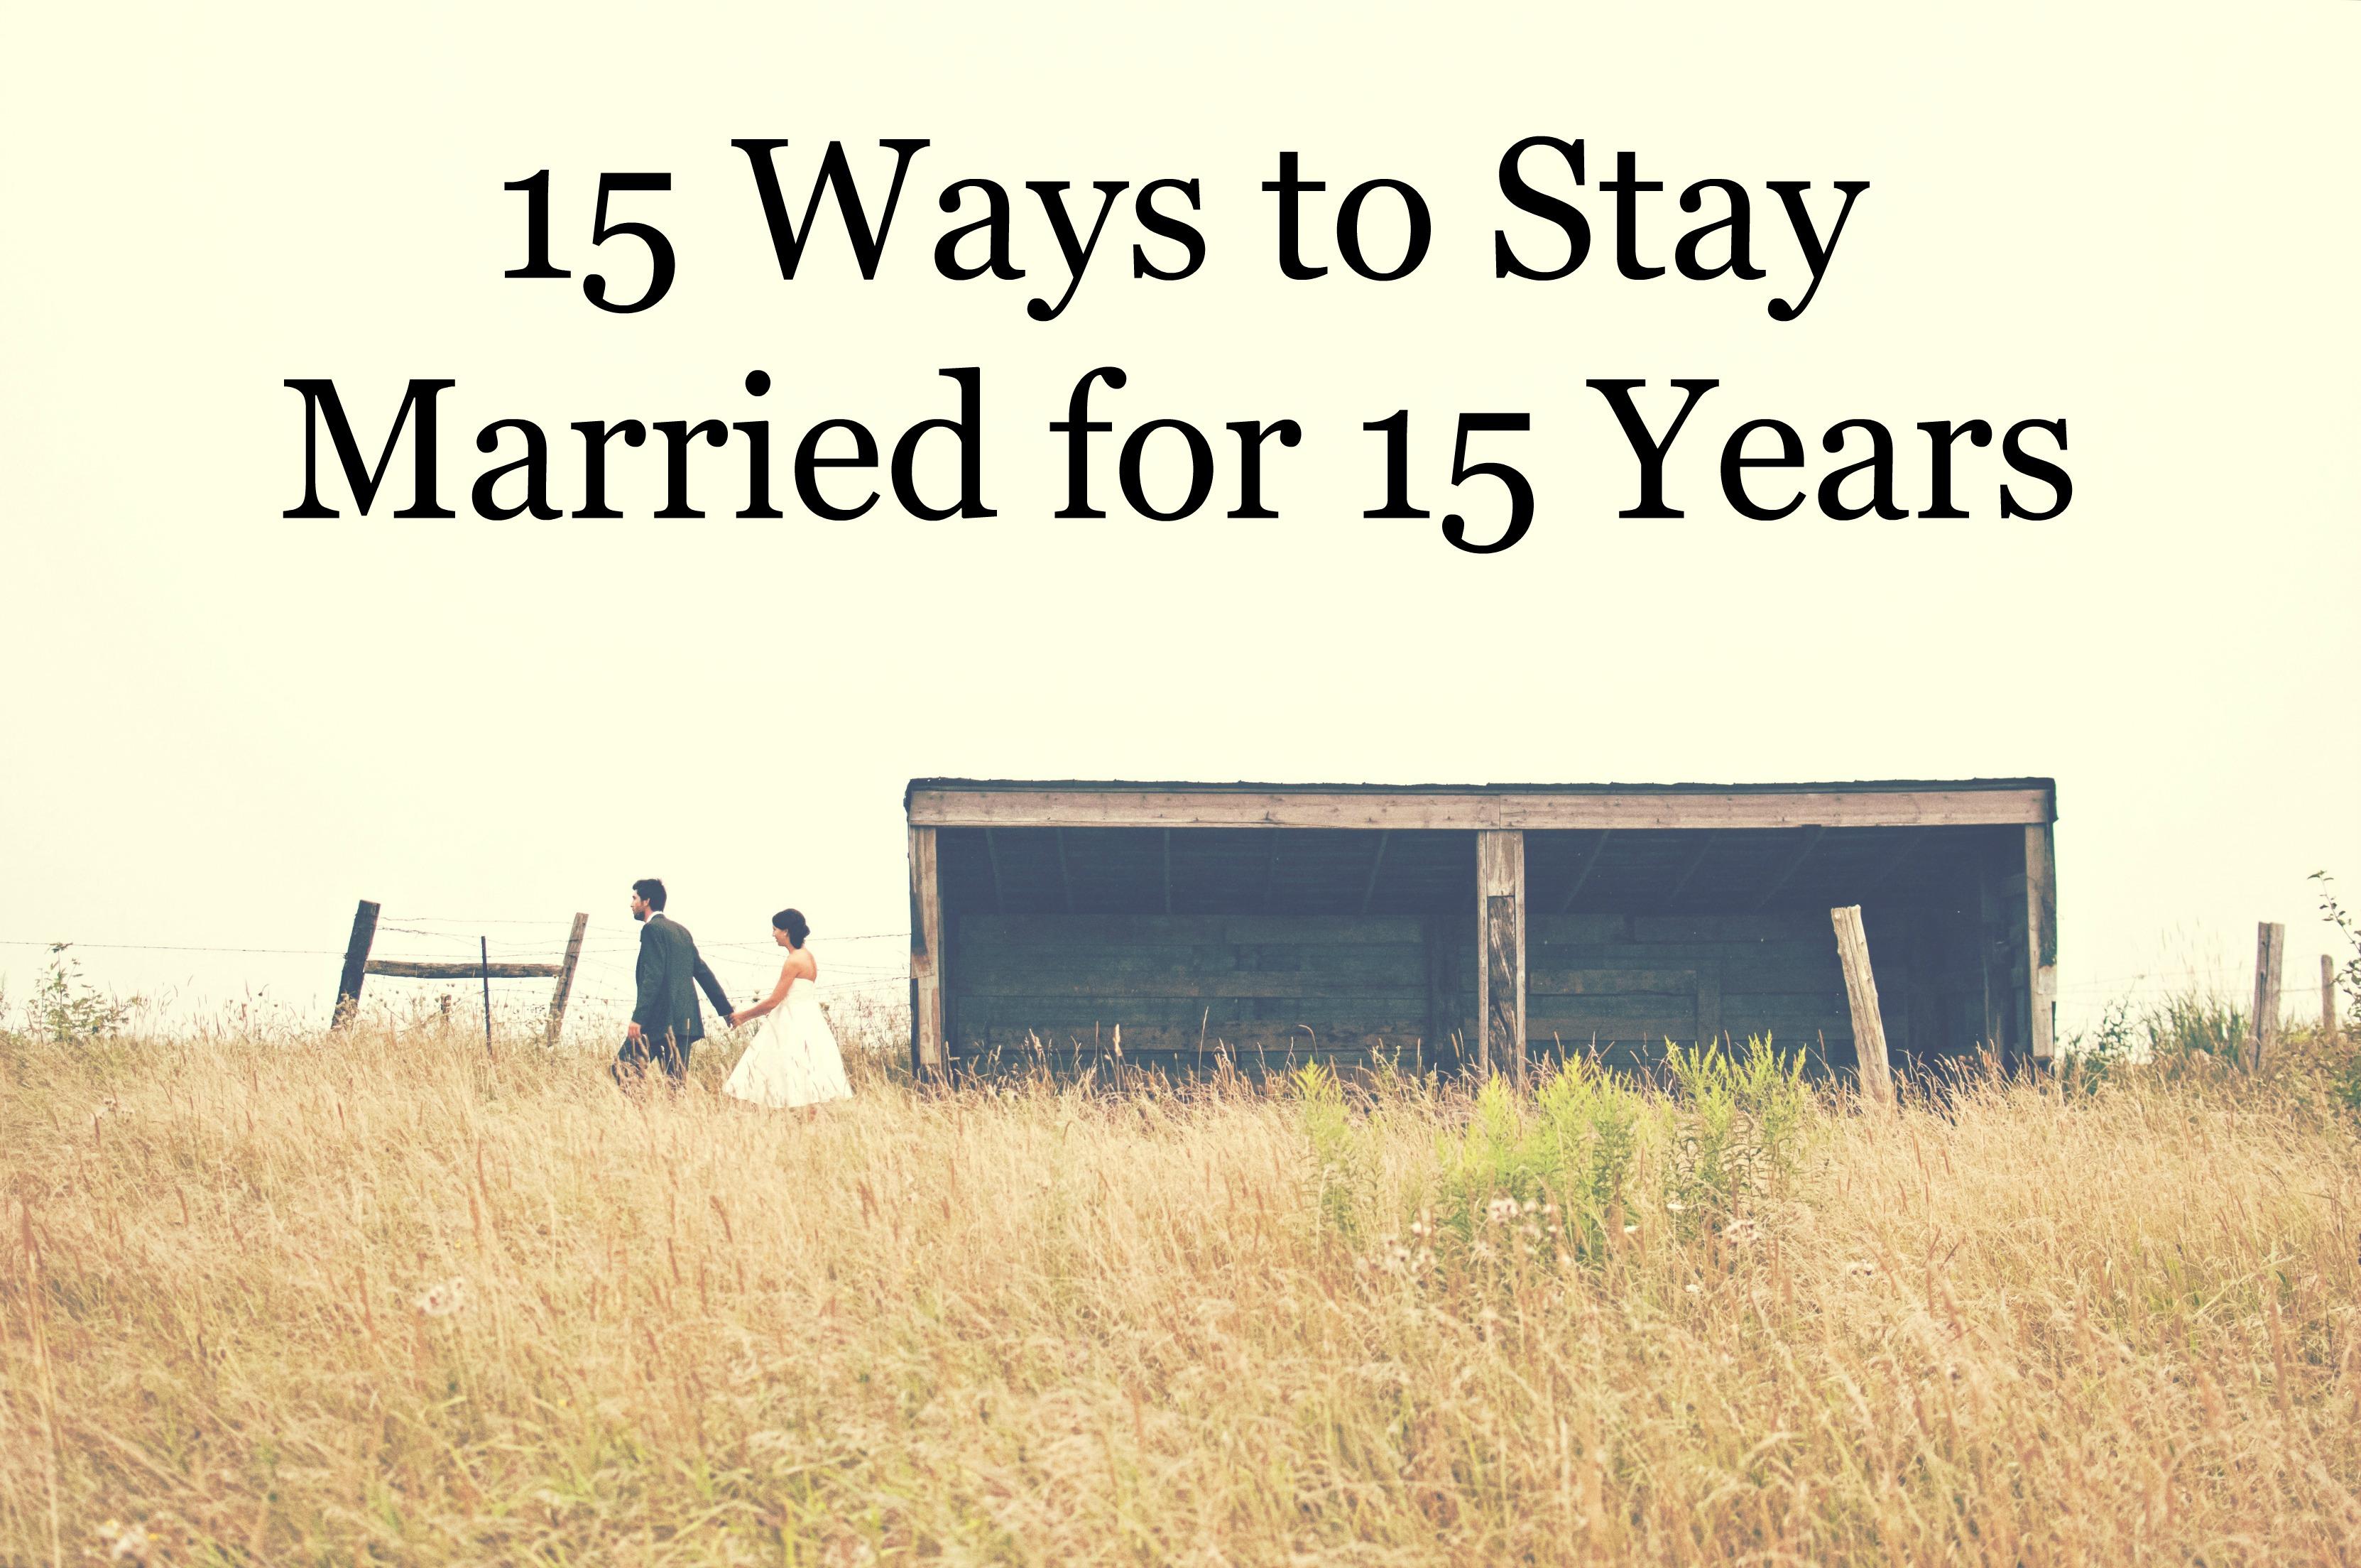 15 way married 15 years